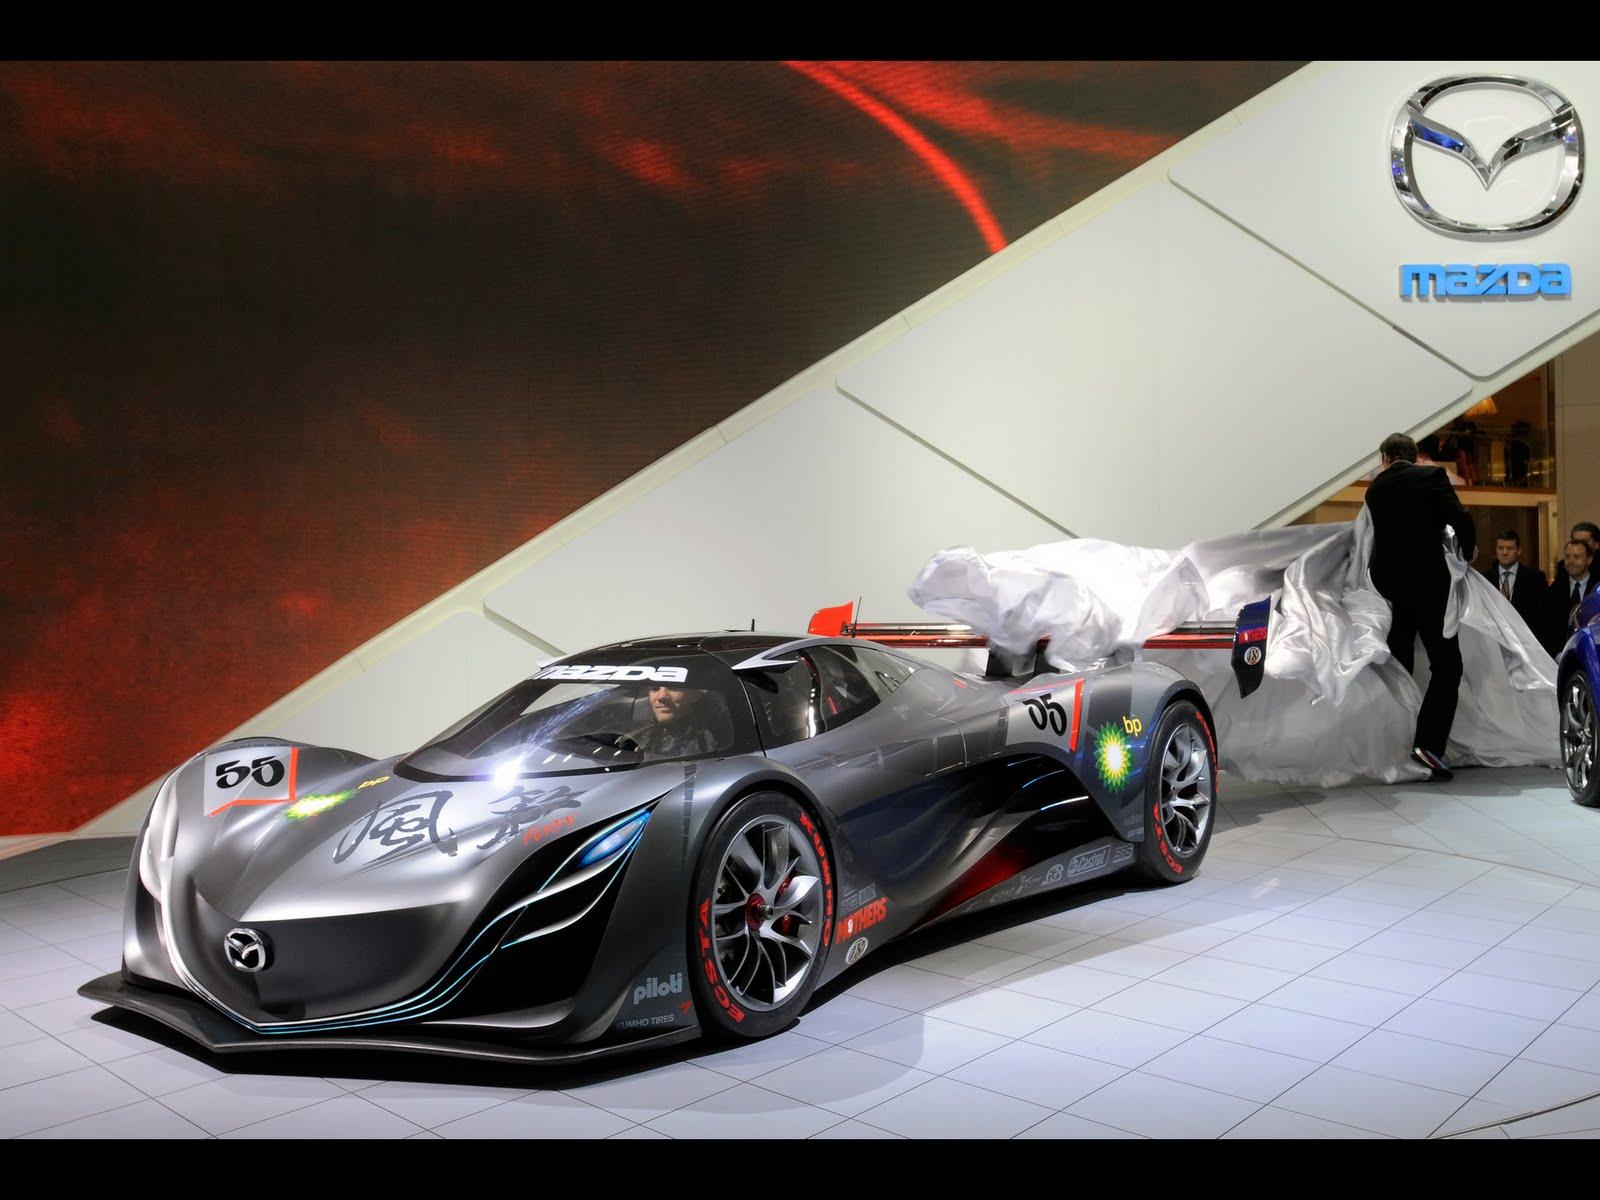 New 2011, 2012 Mazda Car Models ~ Automotive Cars